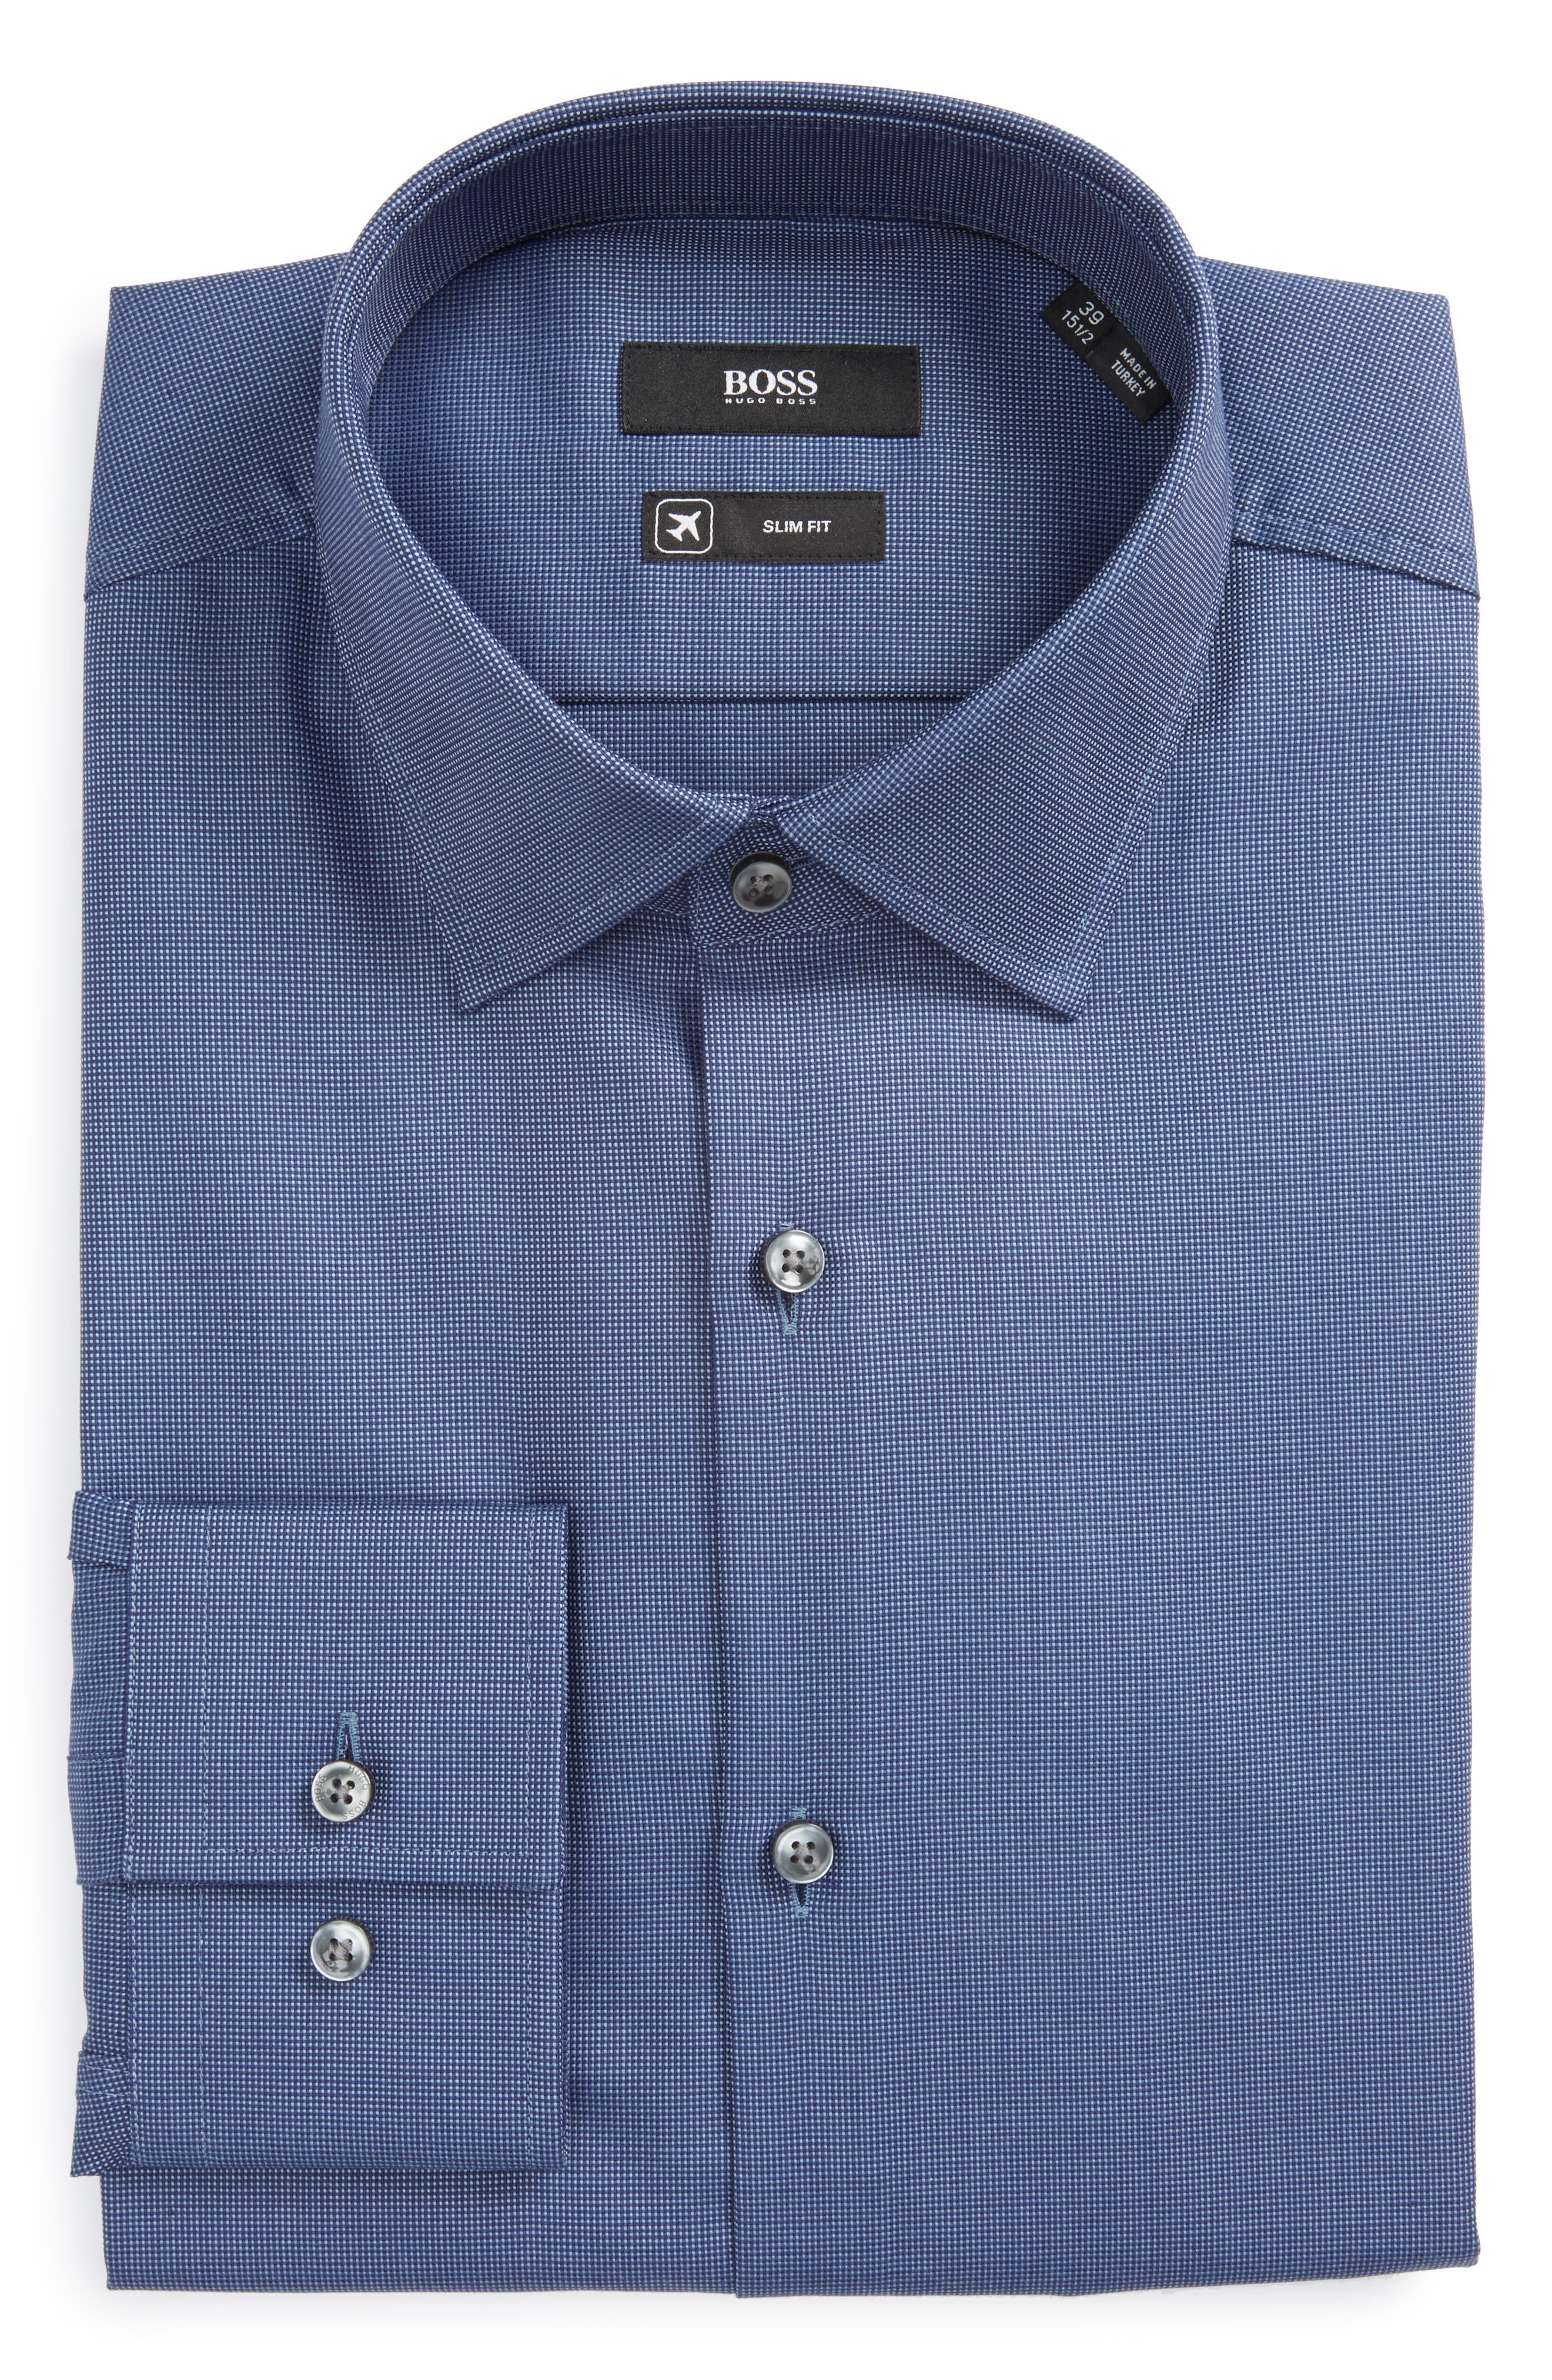 Jenno Slim Fit Solid Dress Shirt,                             Main thumbnail 1, color,                             Medium Blue